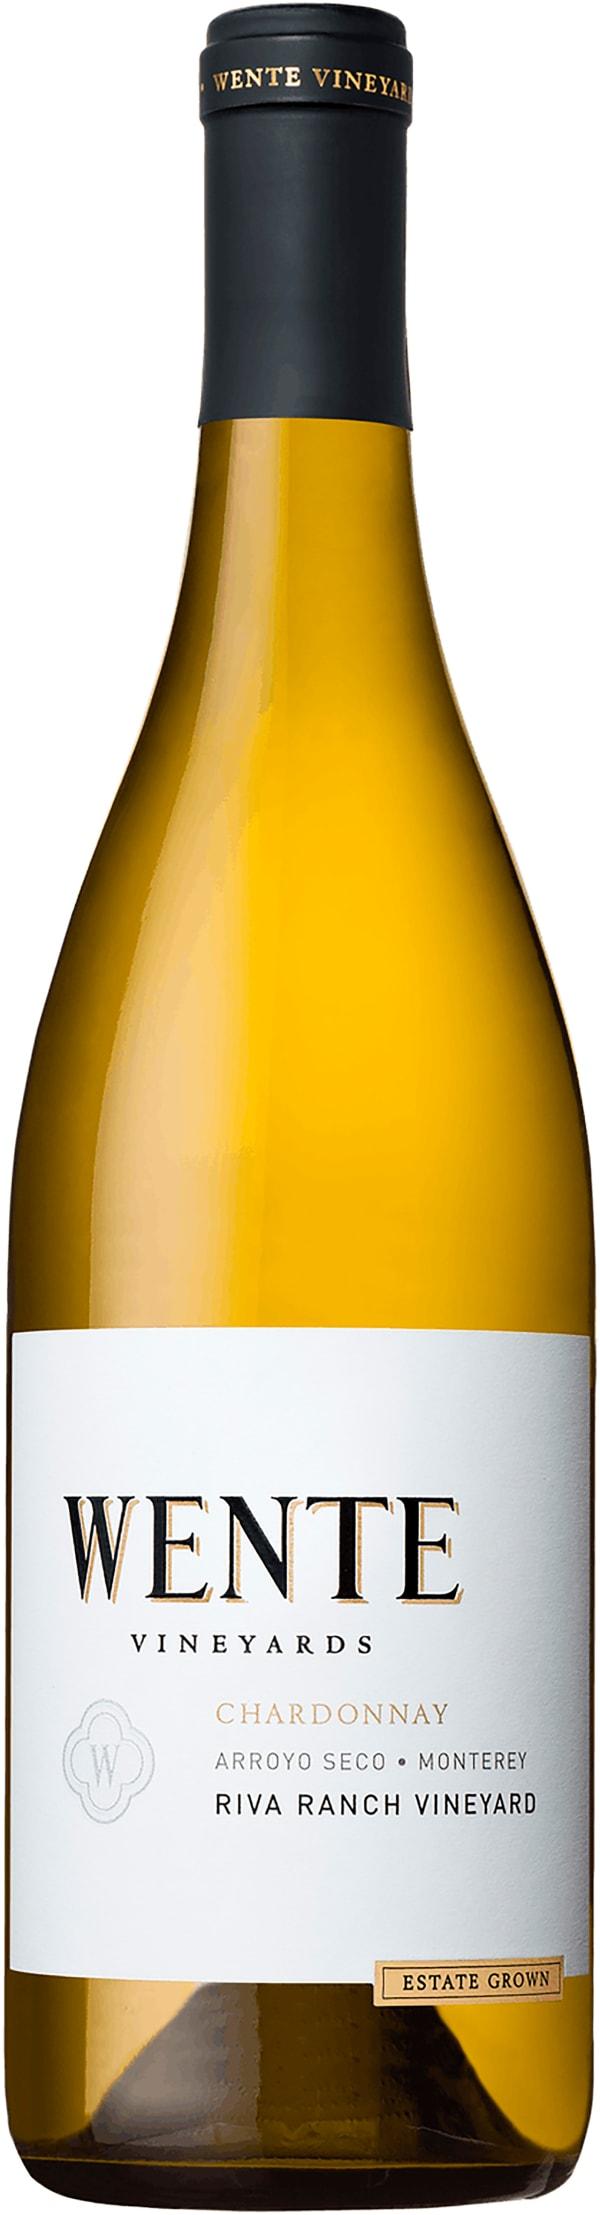 Wente Riva Ranch Chardonnay 2017